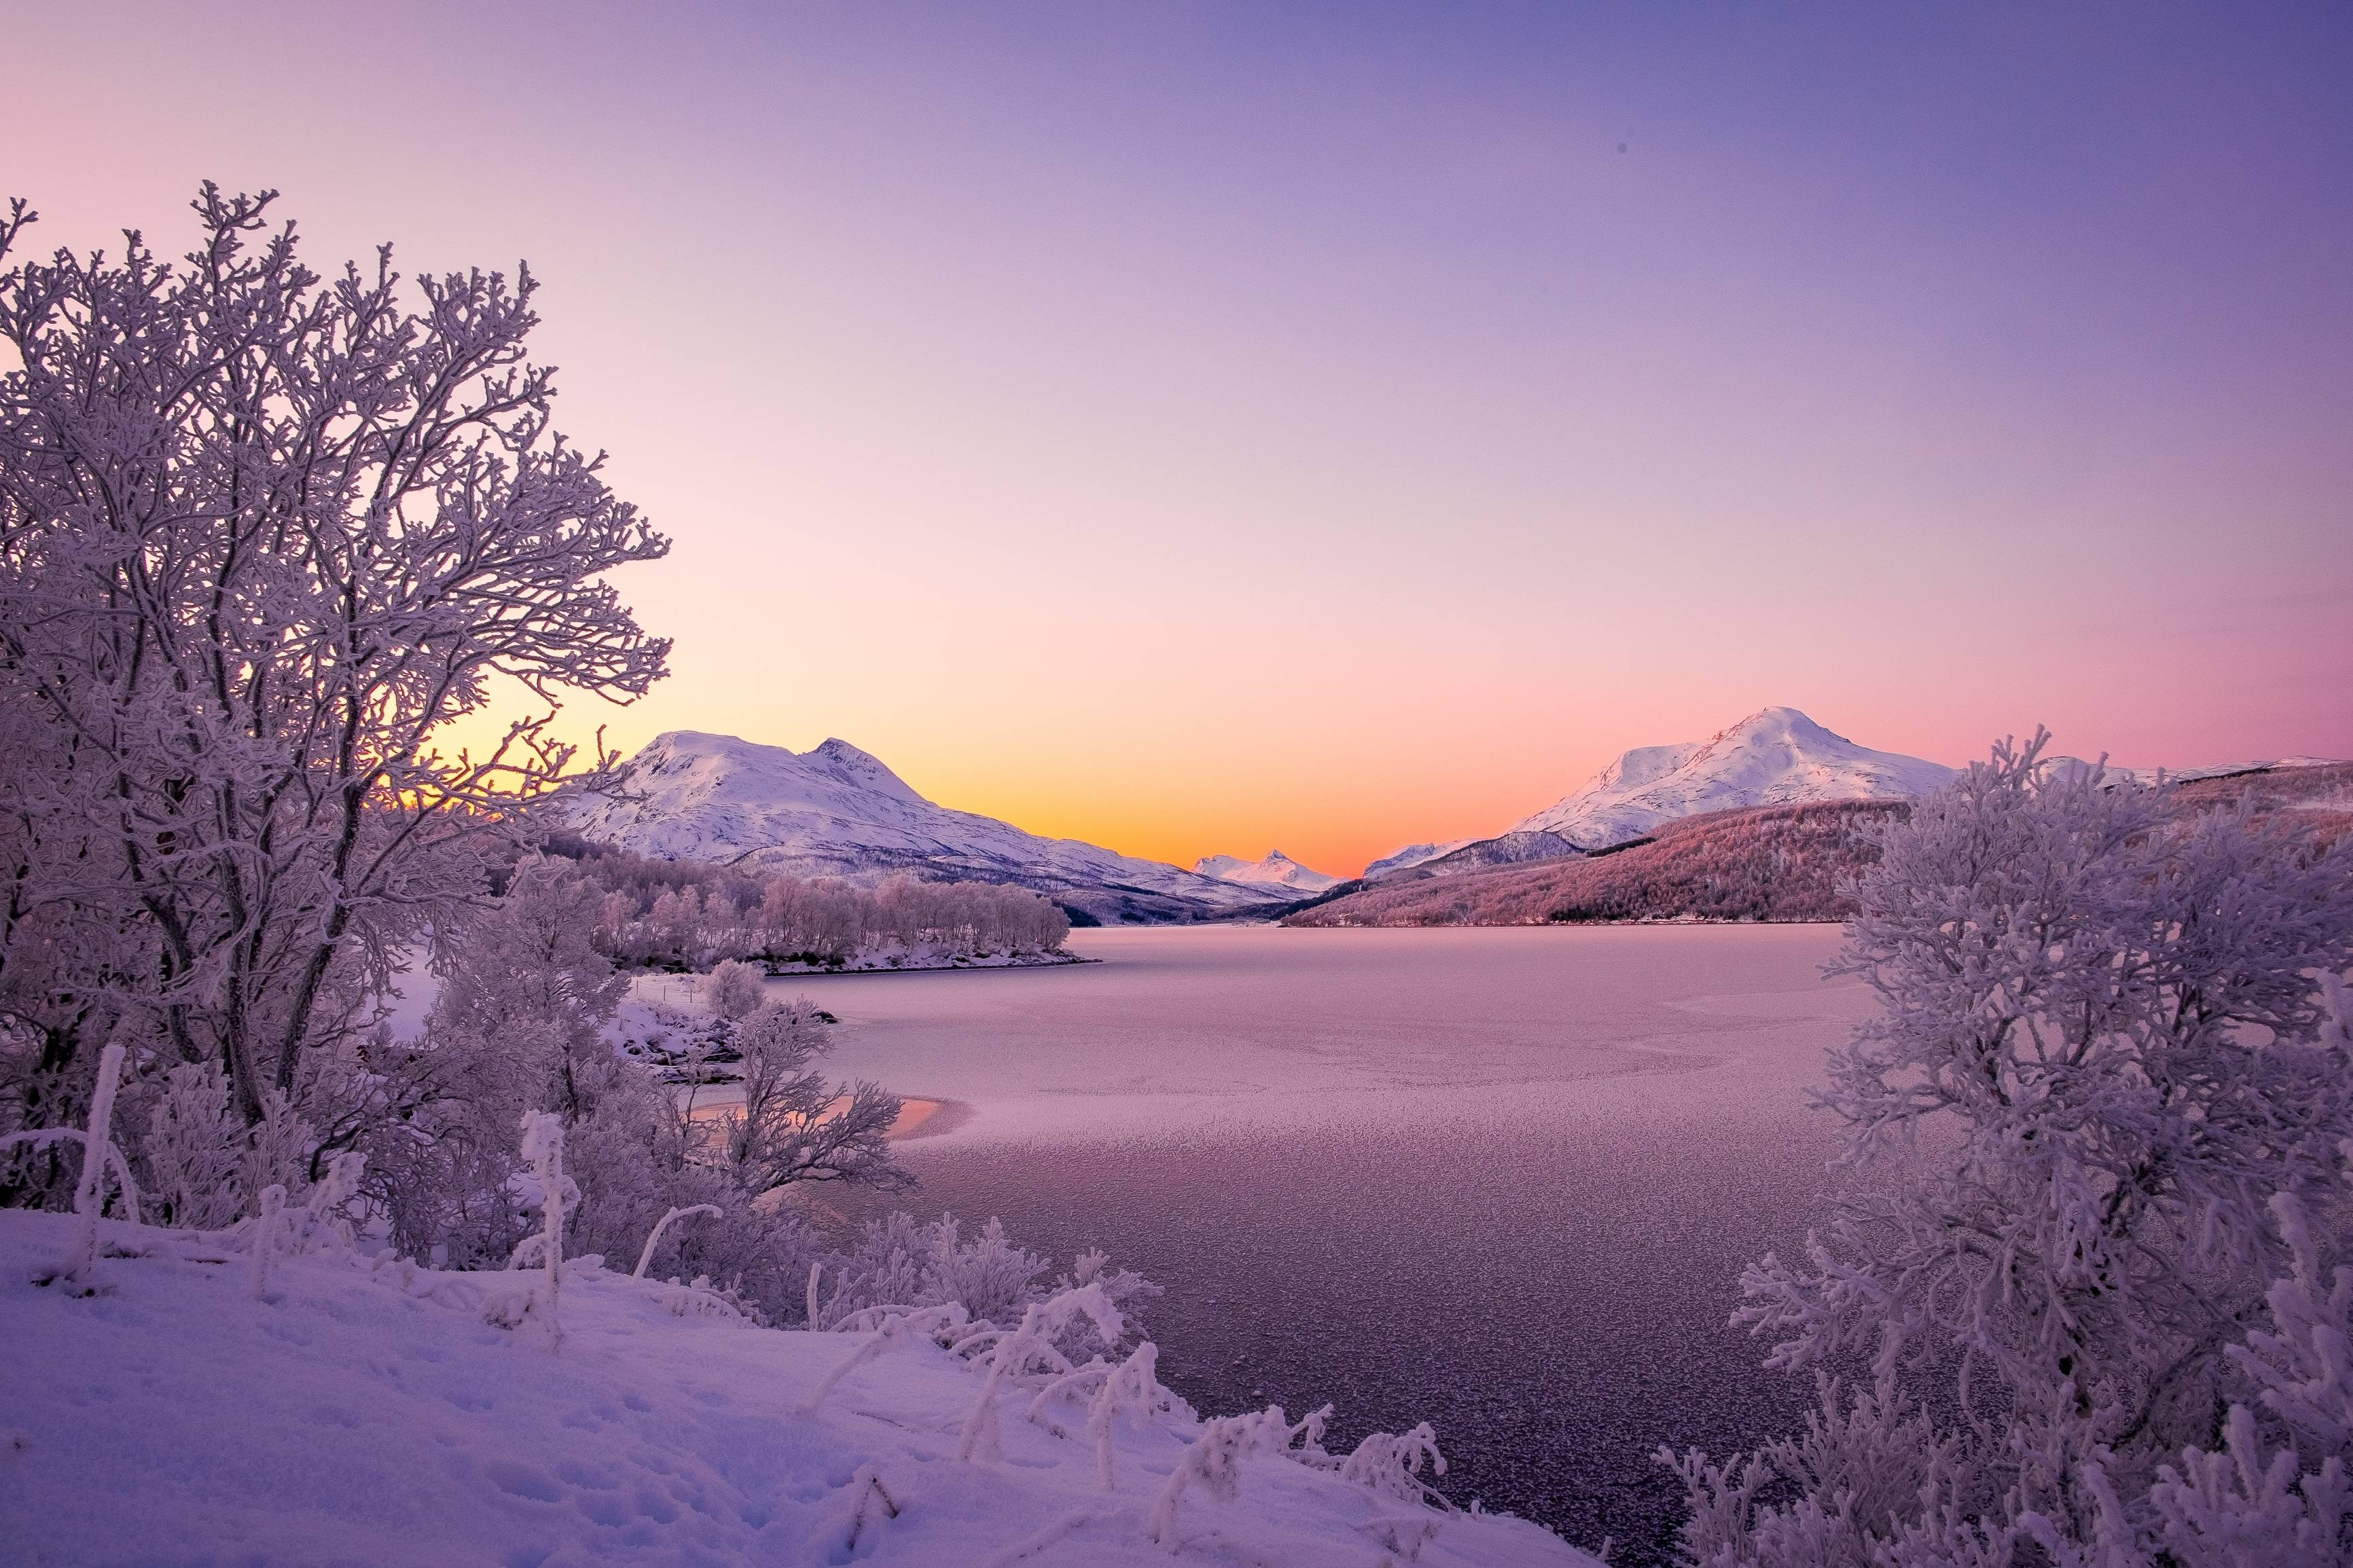 Stor Vann lake, Storvann lake, Norway